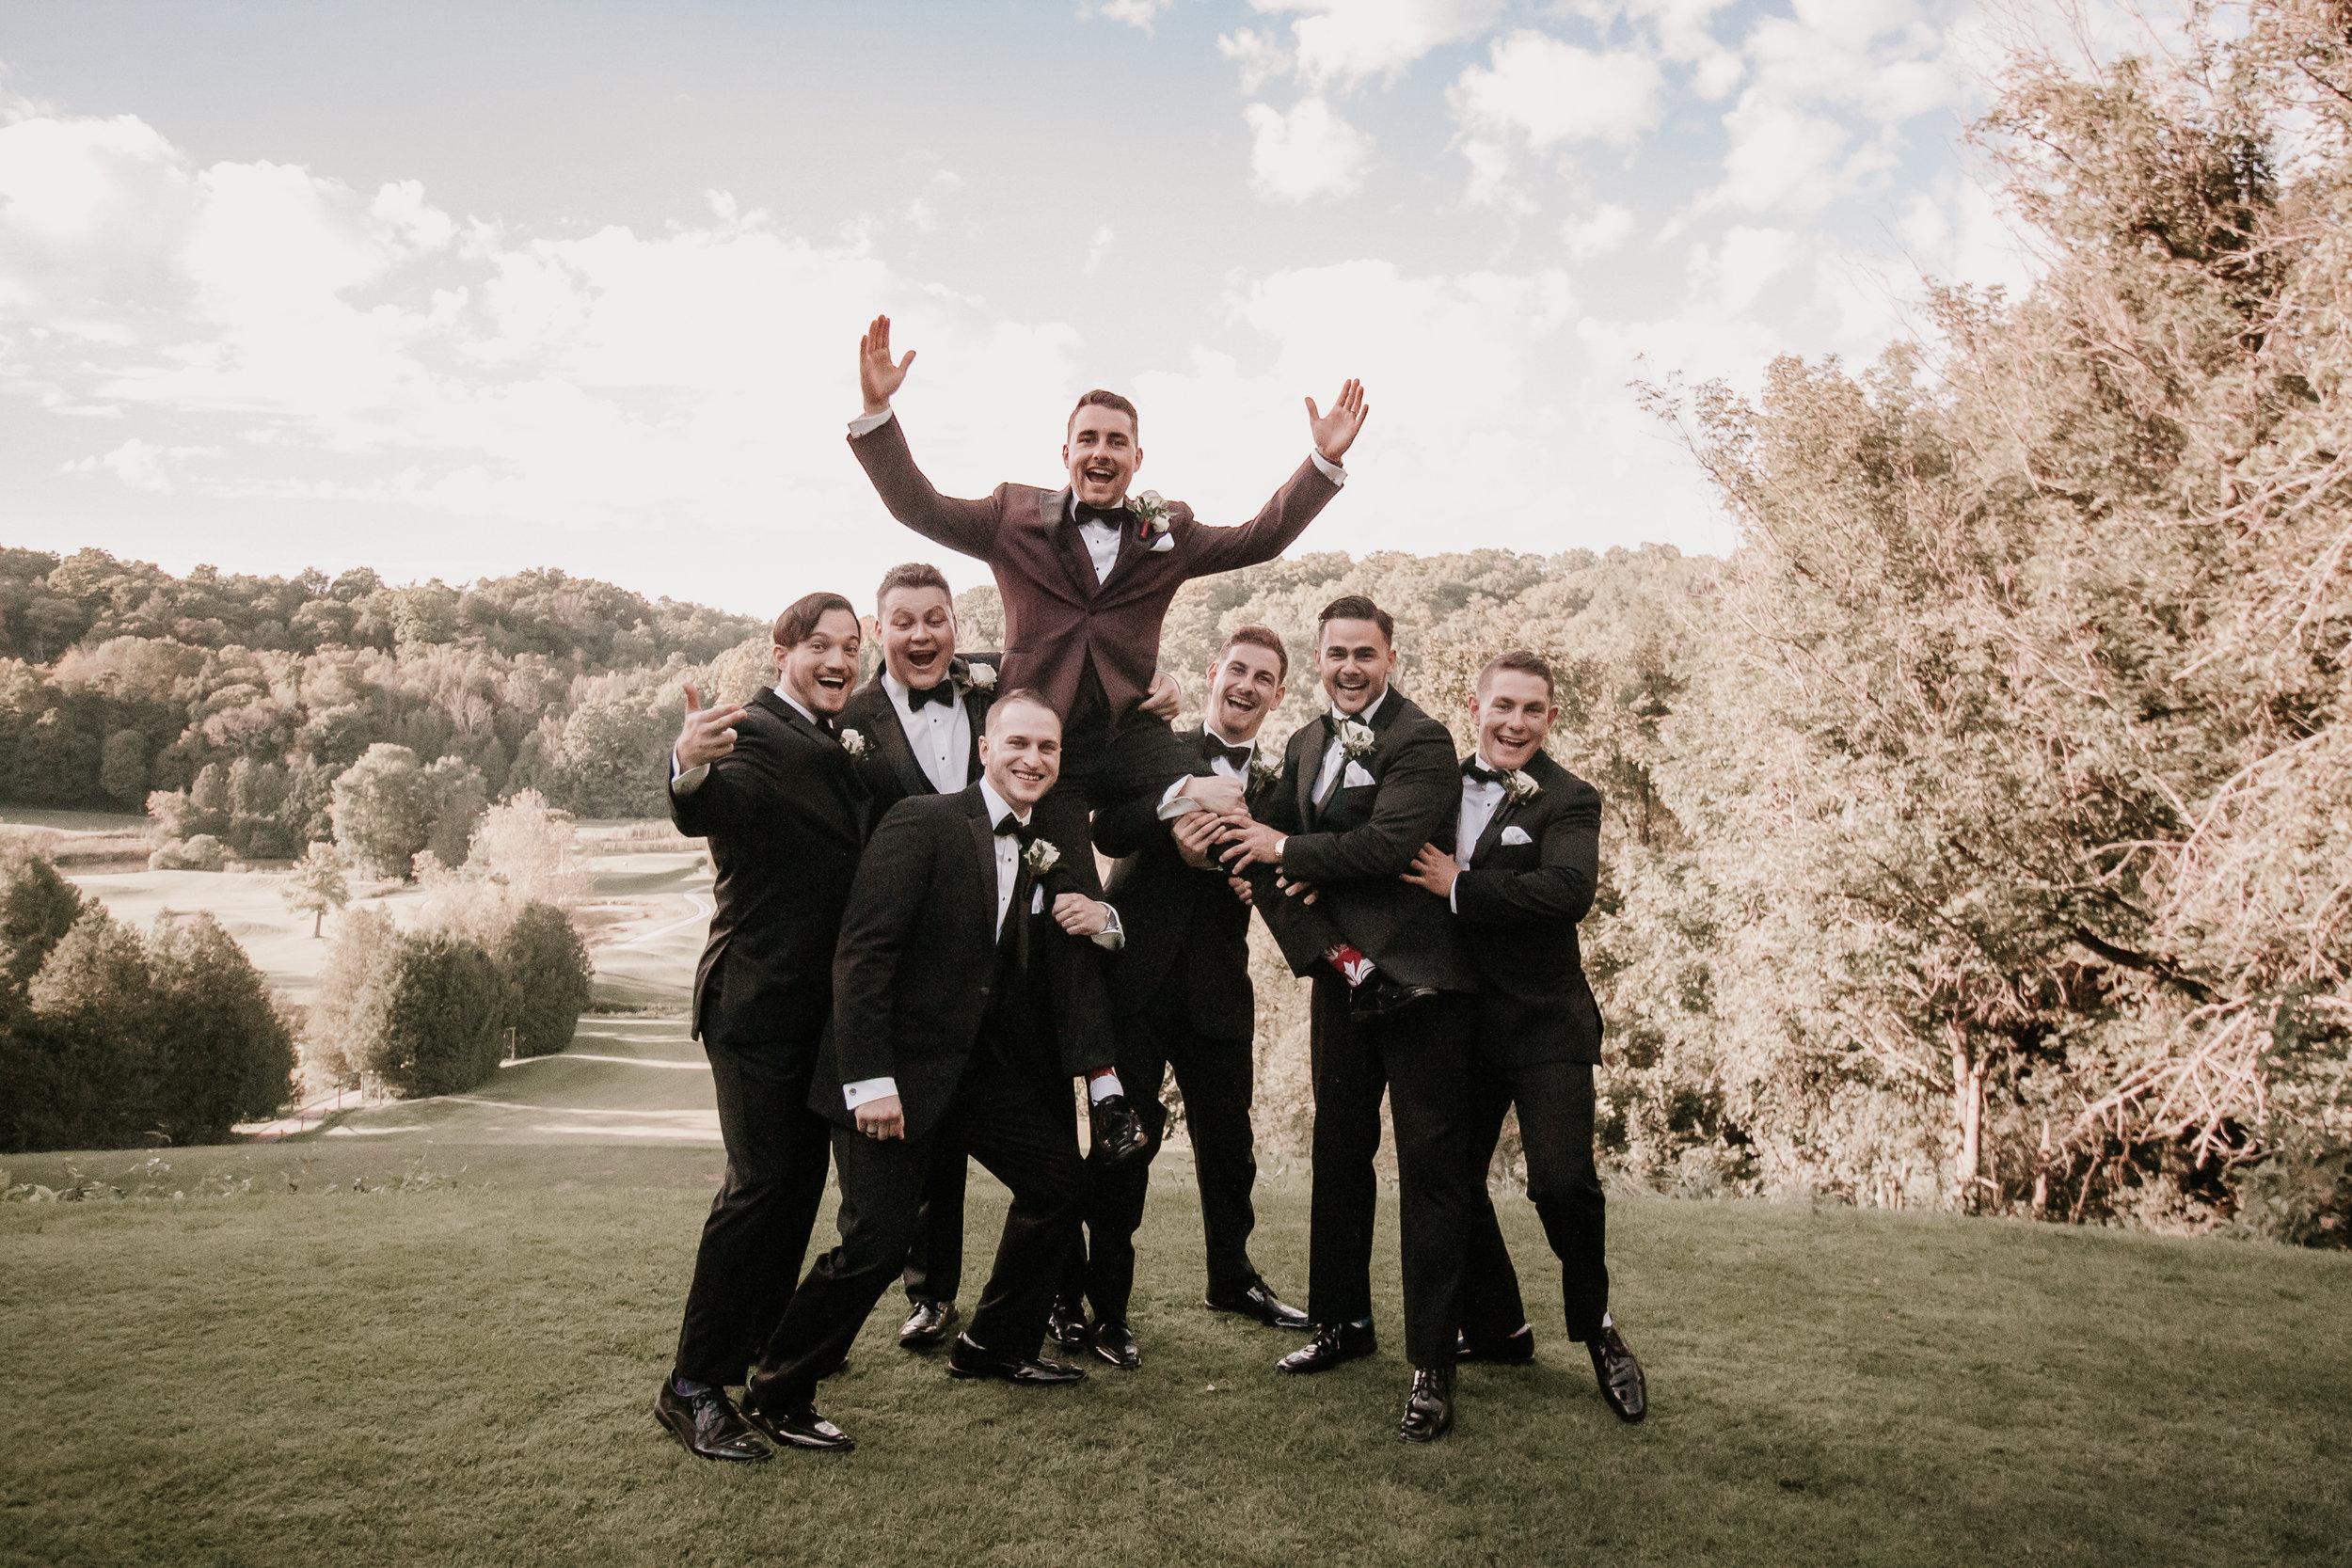 Claremont_fourseasons_Wedding-329.jpg